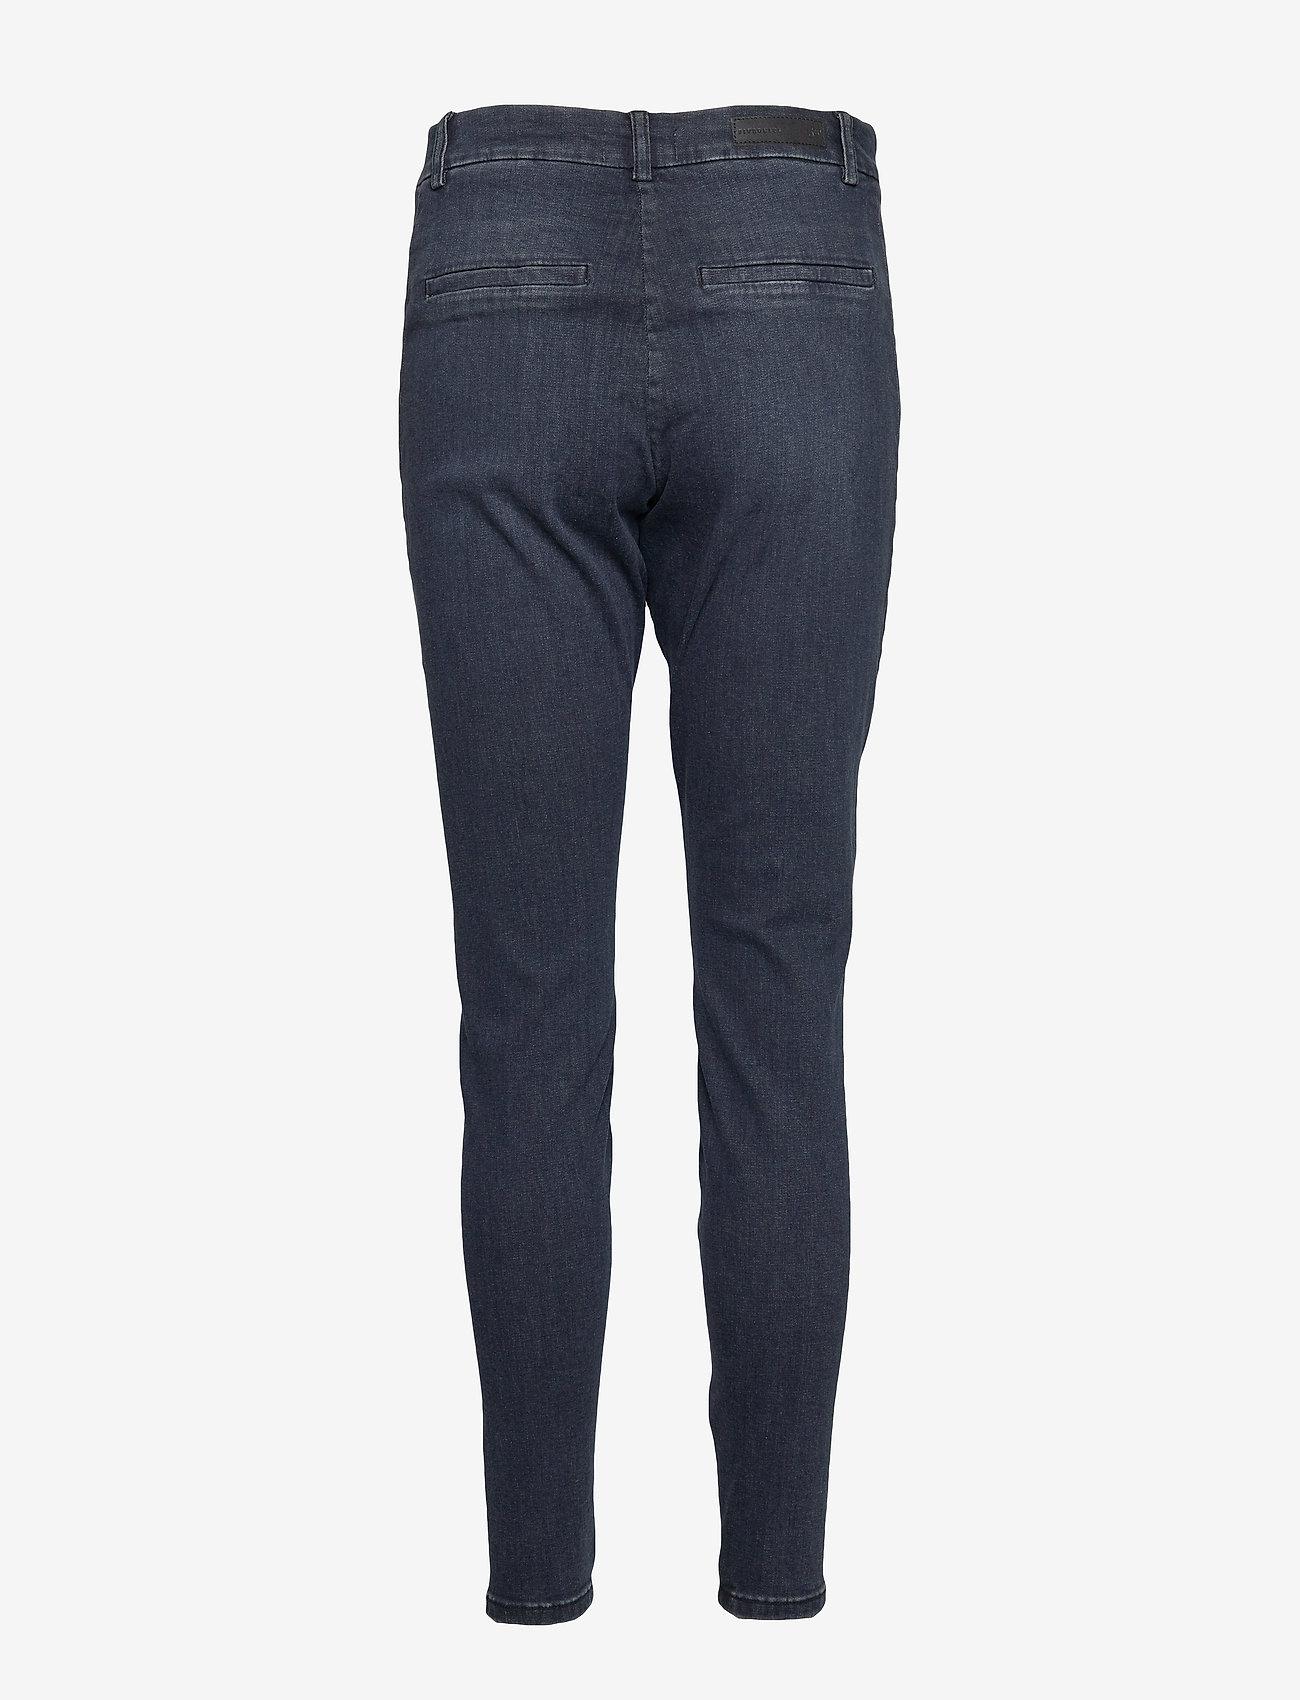 FIVEUNITS - Angelie 455 Jean - skinny jeans - neon blue raini - 1